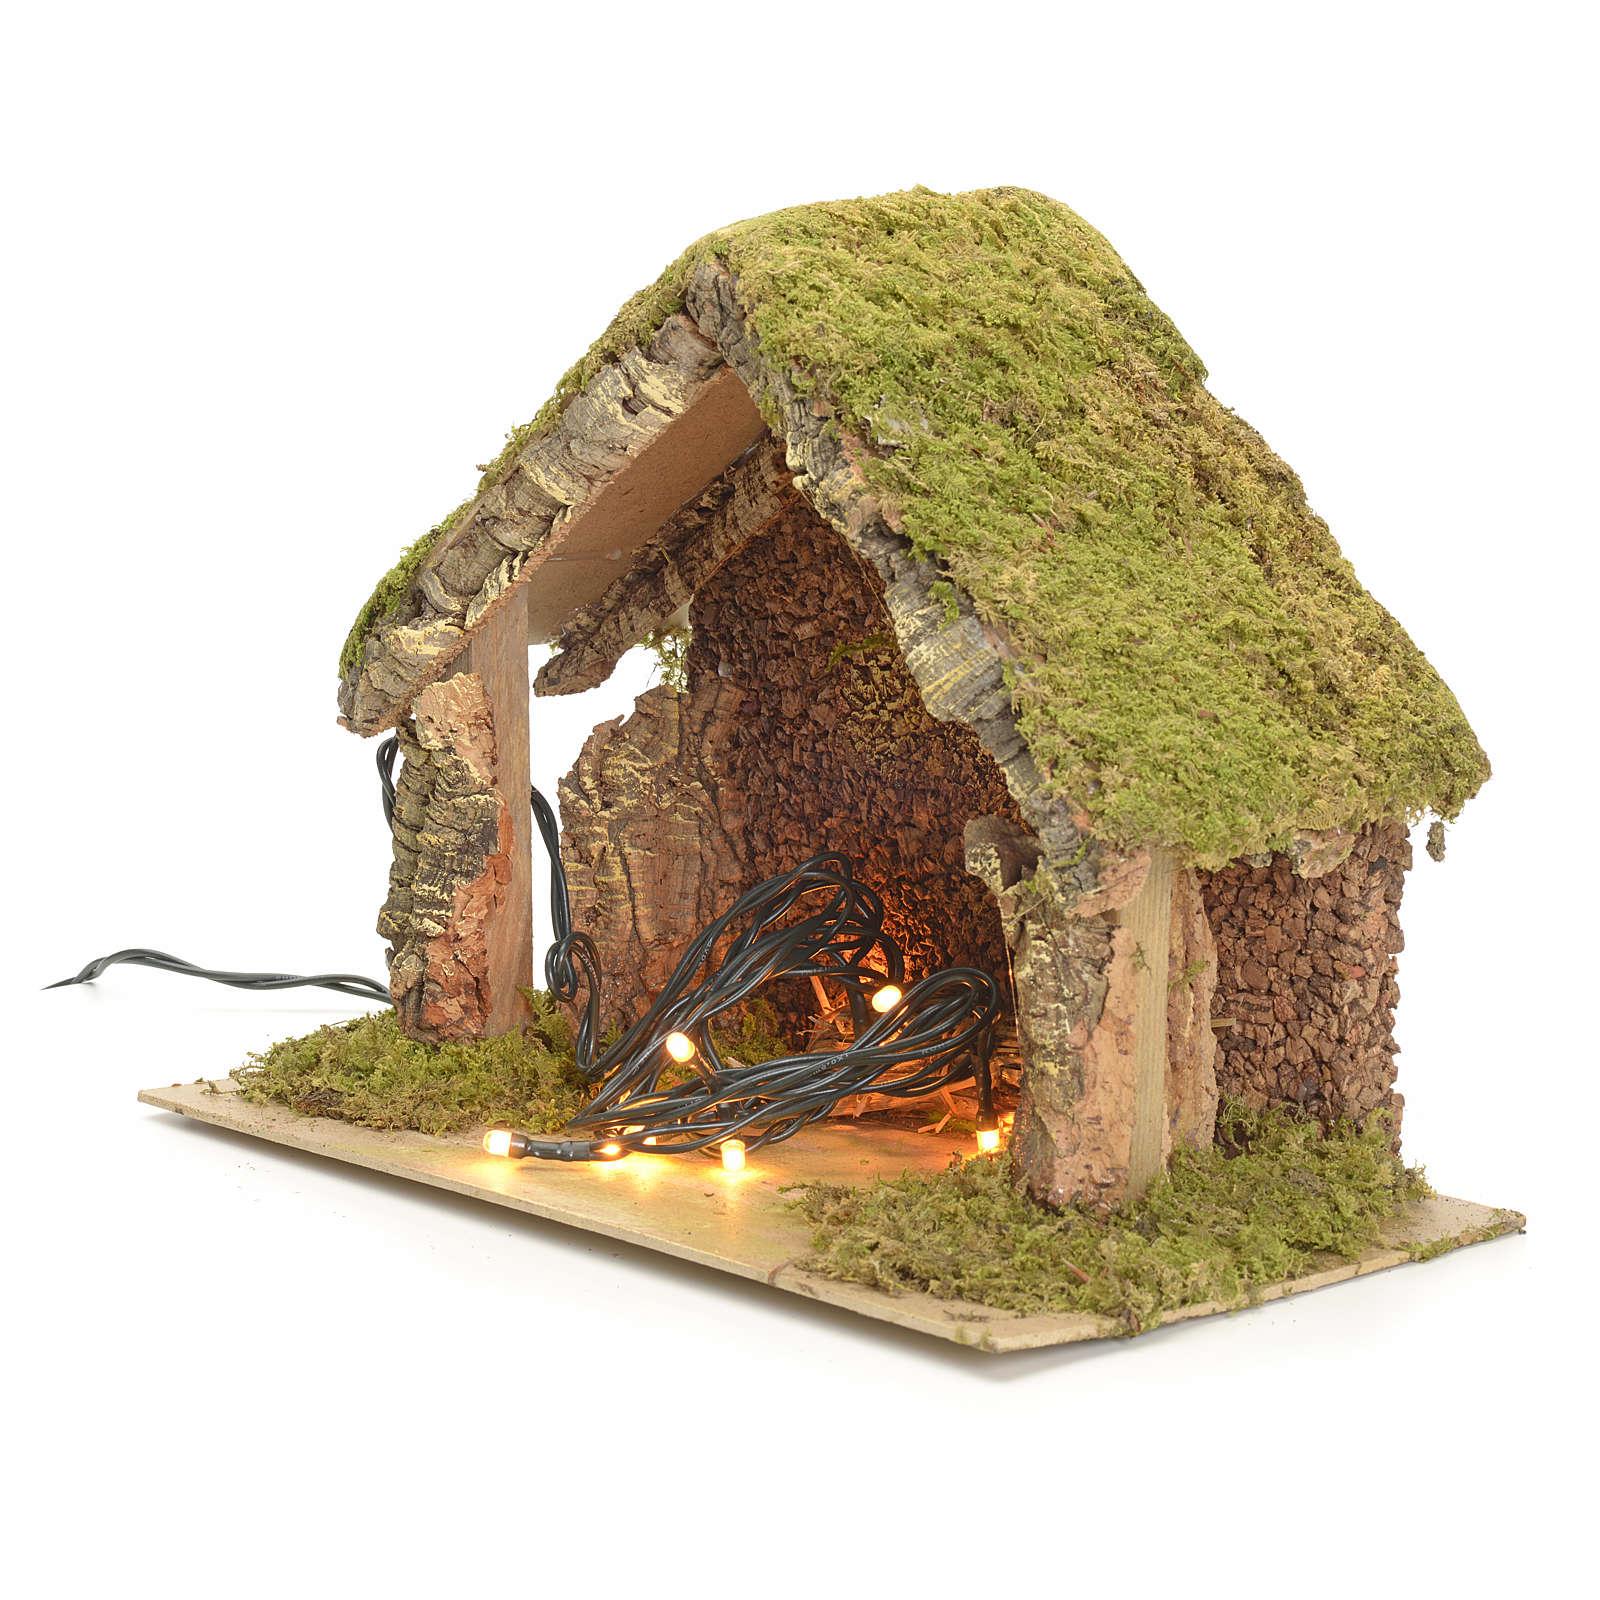 Capanna presepe illuminata tetto a punta 24x32x18 4